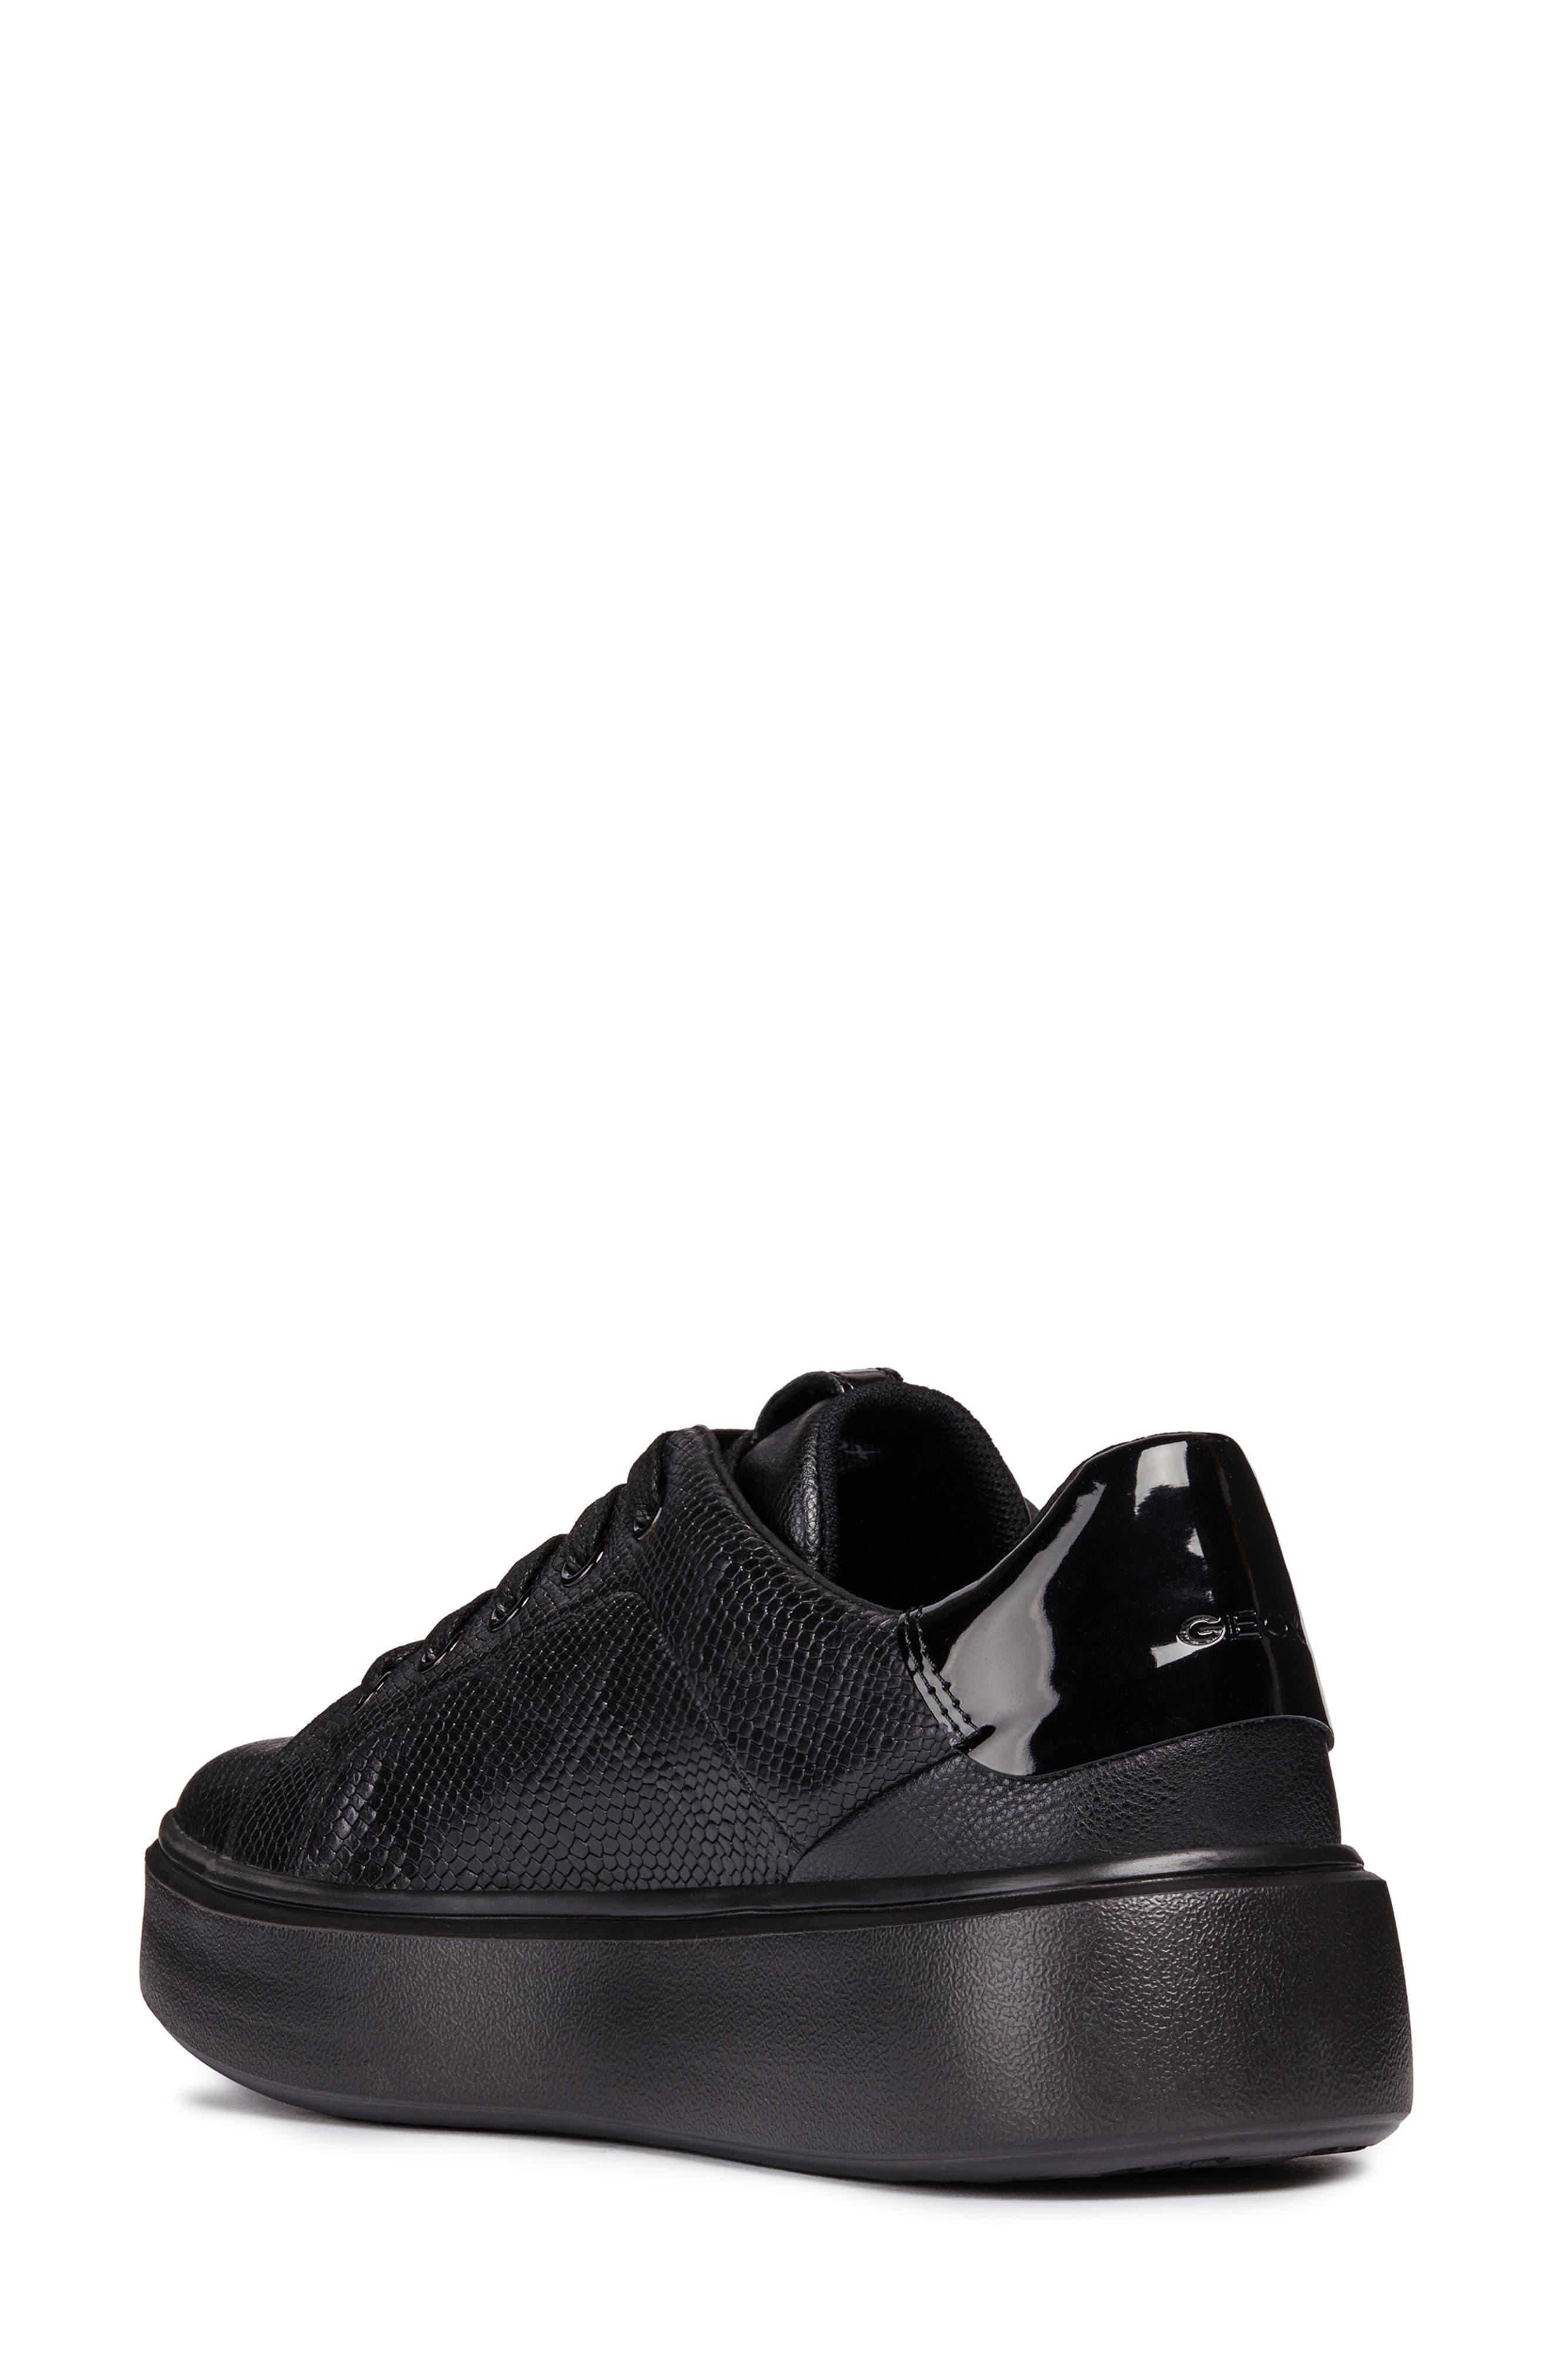 Nhenbus Sneaker,                             Alternate thumbnail 2, color,                             BLACK LEATHER